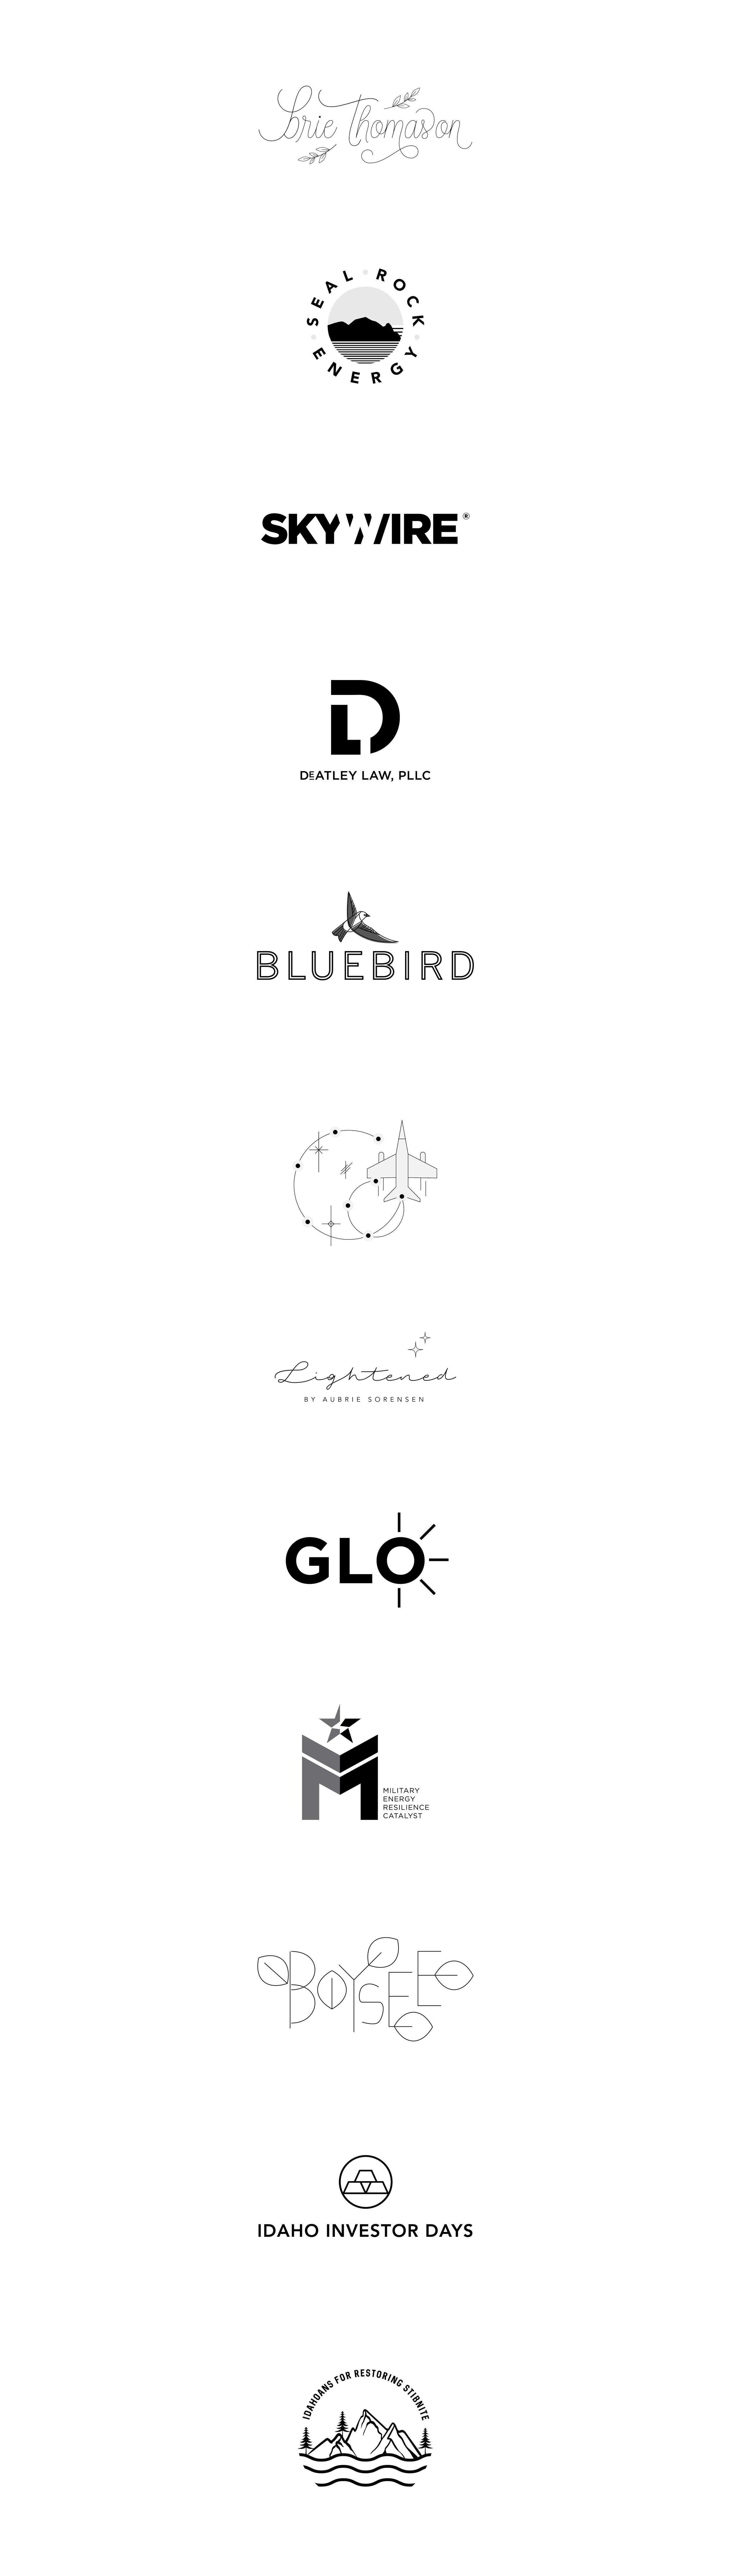 logo-page3.jpg